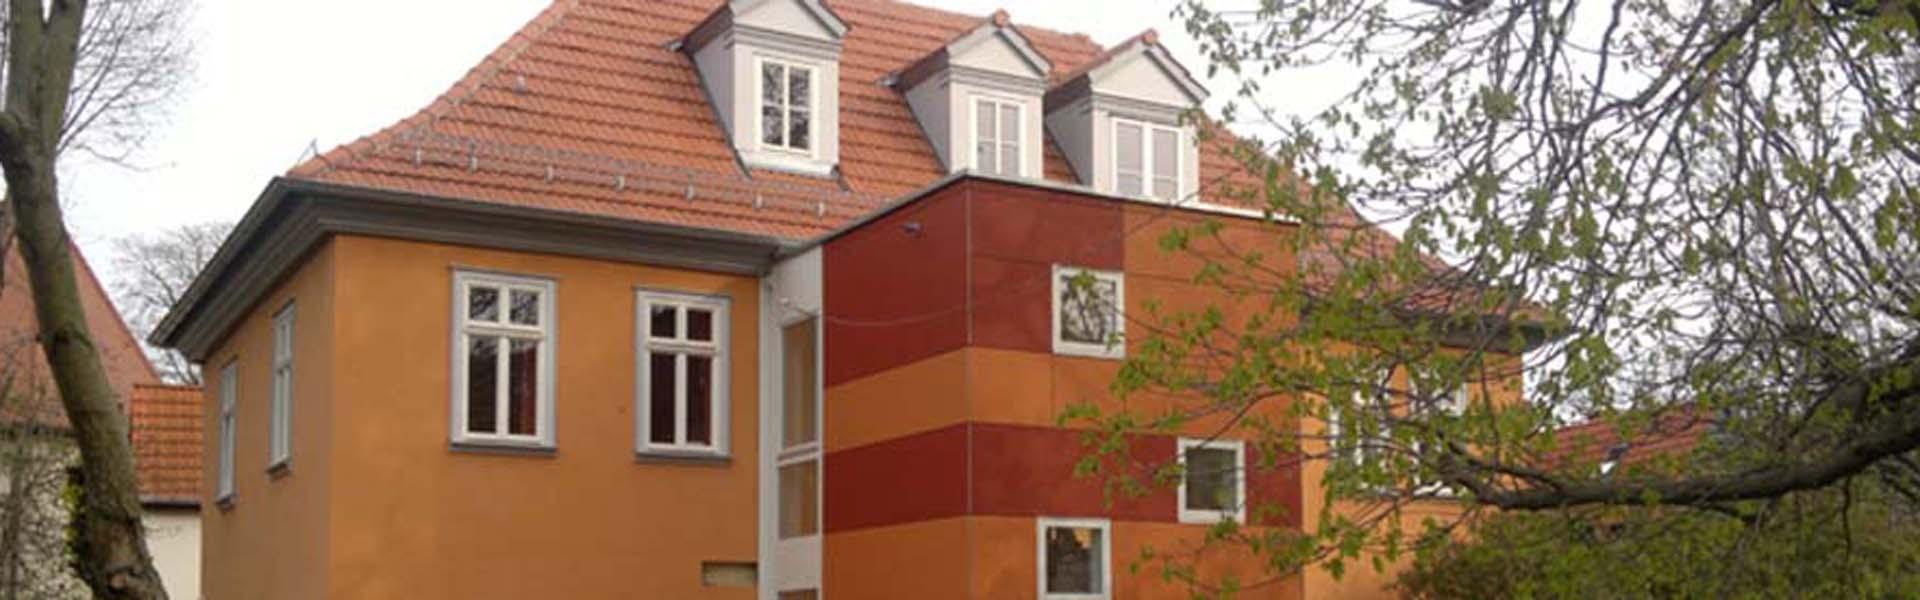 treppenhaus f r kindergarten th ringer holzhaus. Black Bedroom Furniture Sets. Home Design Ideas